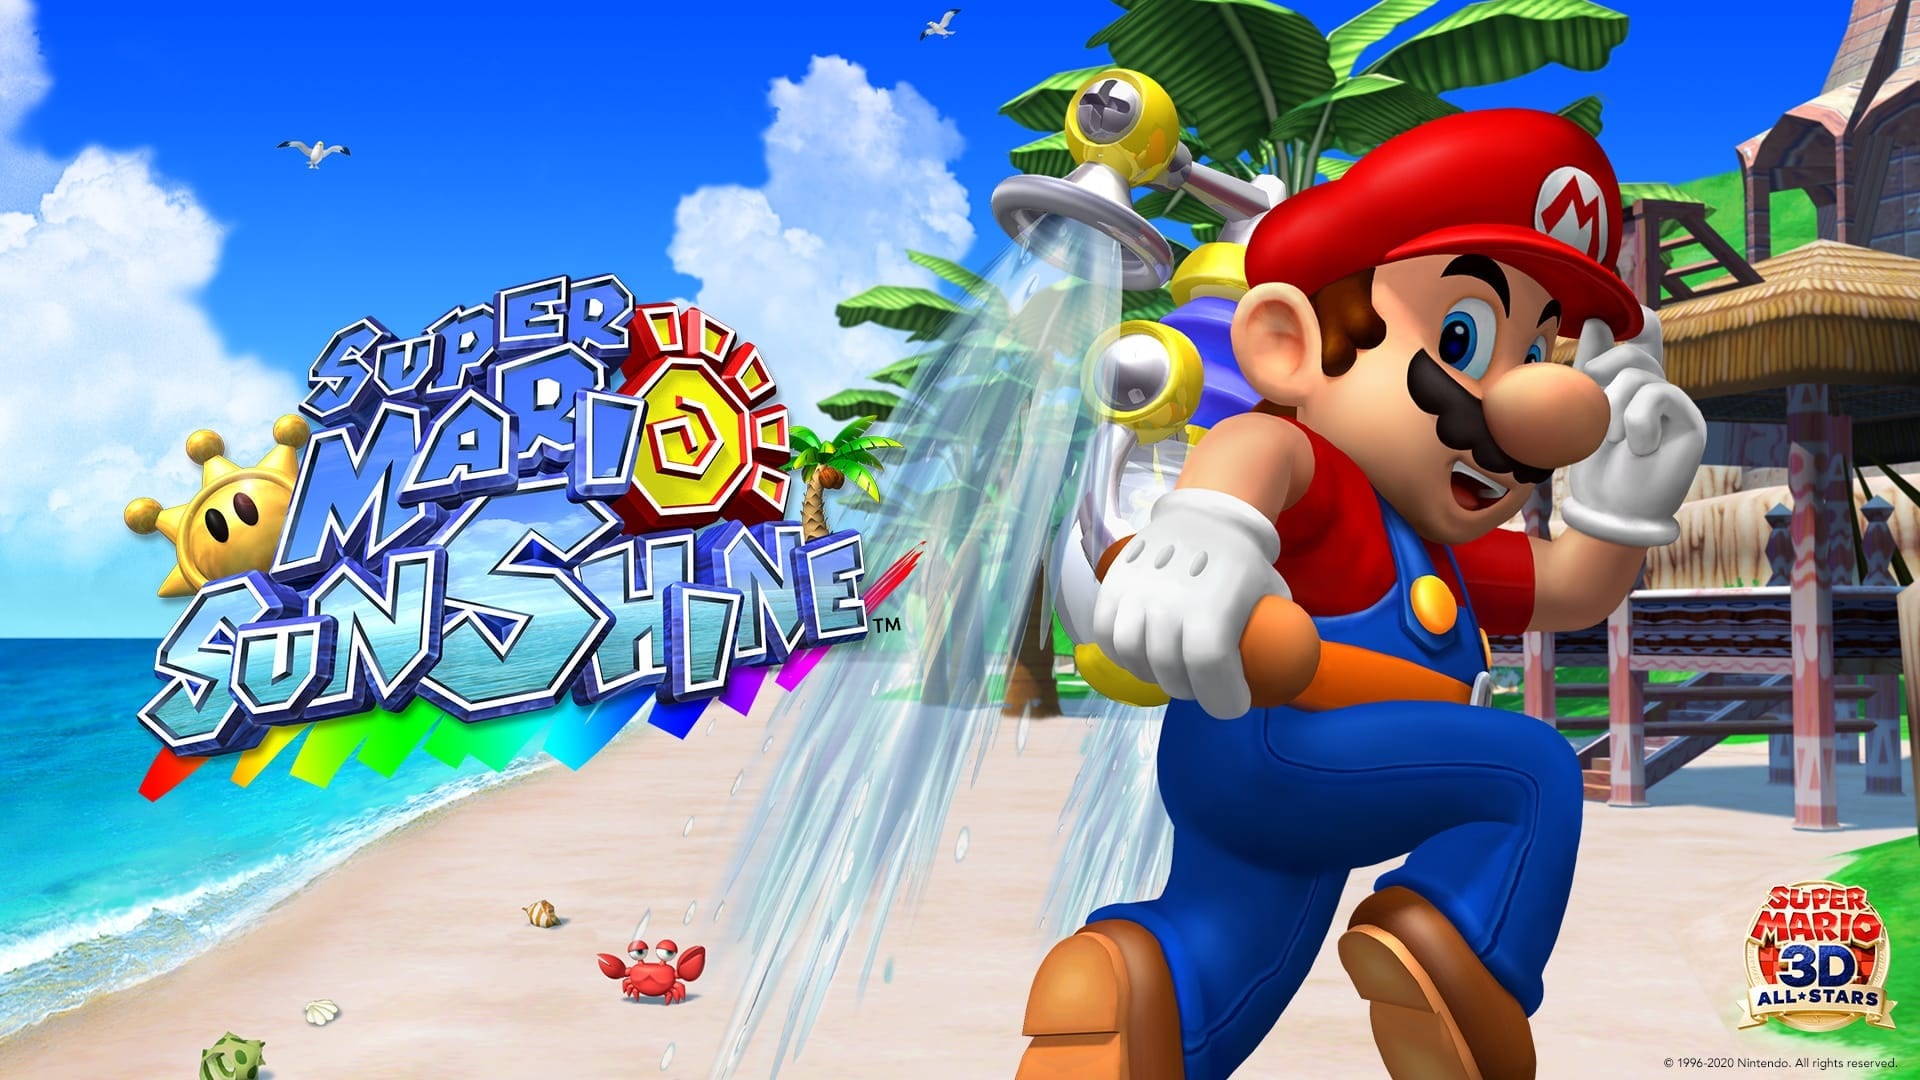 Super Mario Sunshine, How to et Hawaiian Shirt